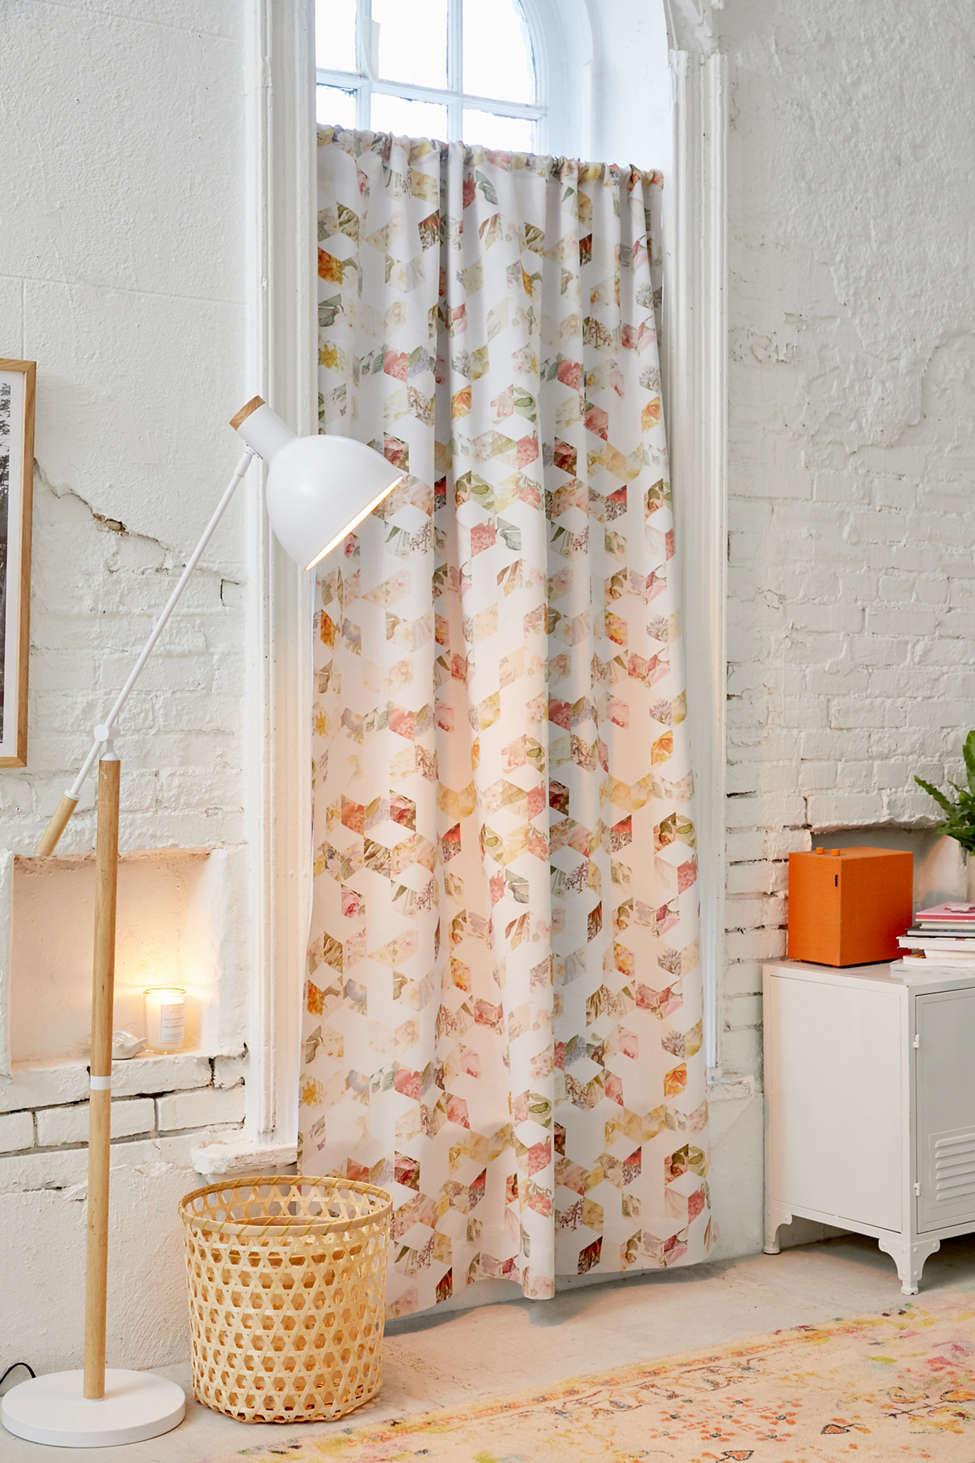 Slide View: 1: Florent Bodart For Deny Geo Flowers Room Darkening Window Panel